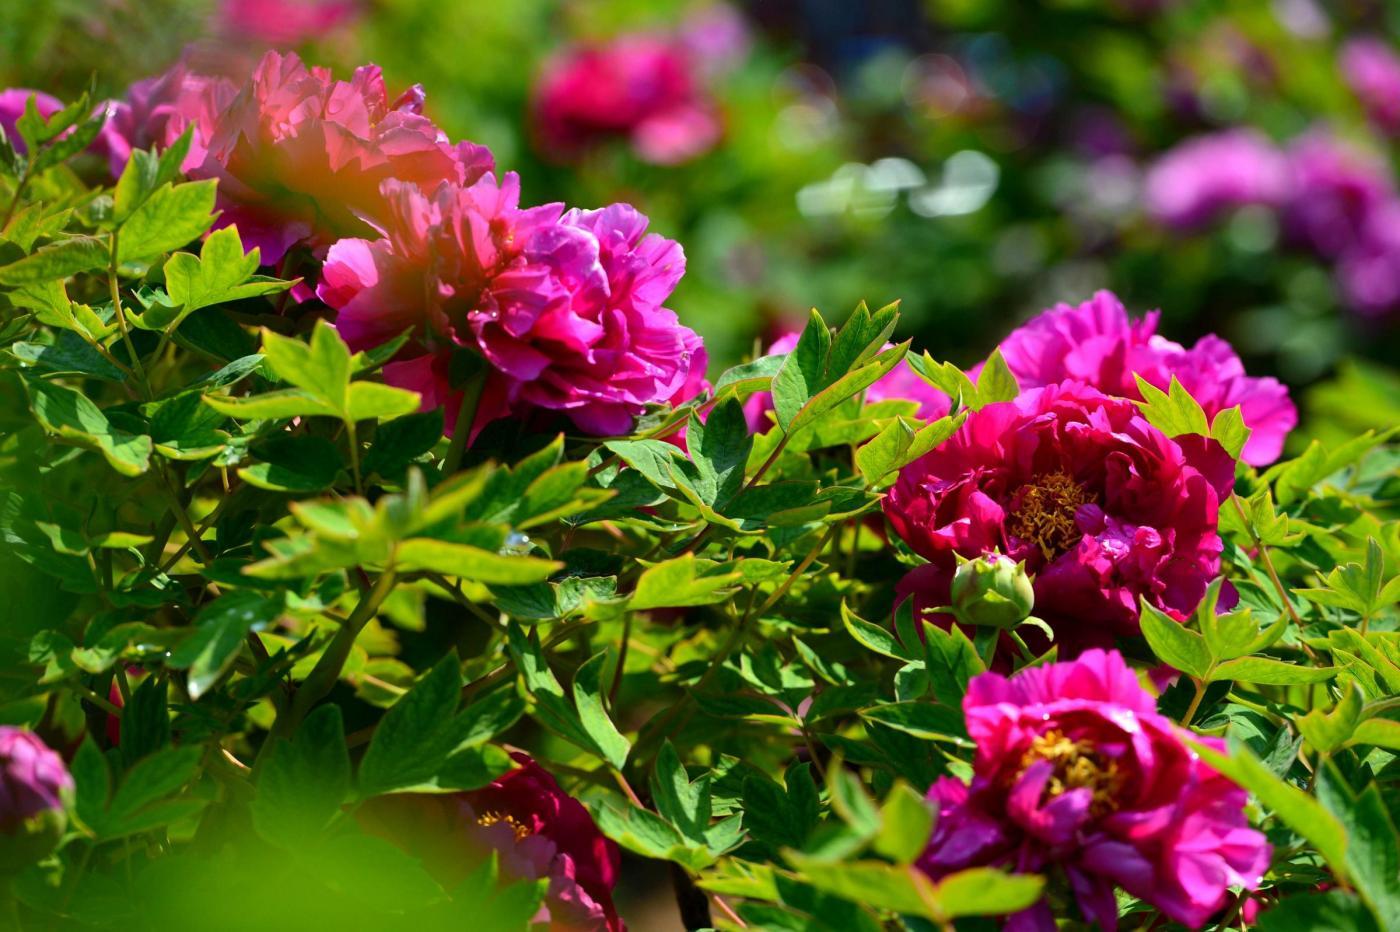 Cina fiori nel giardino botanico di jinan foto - Fiori di giardino ...